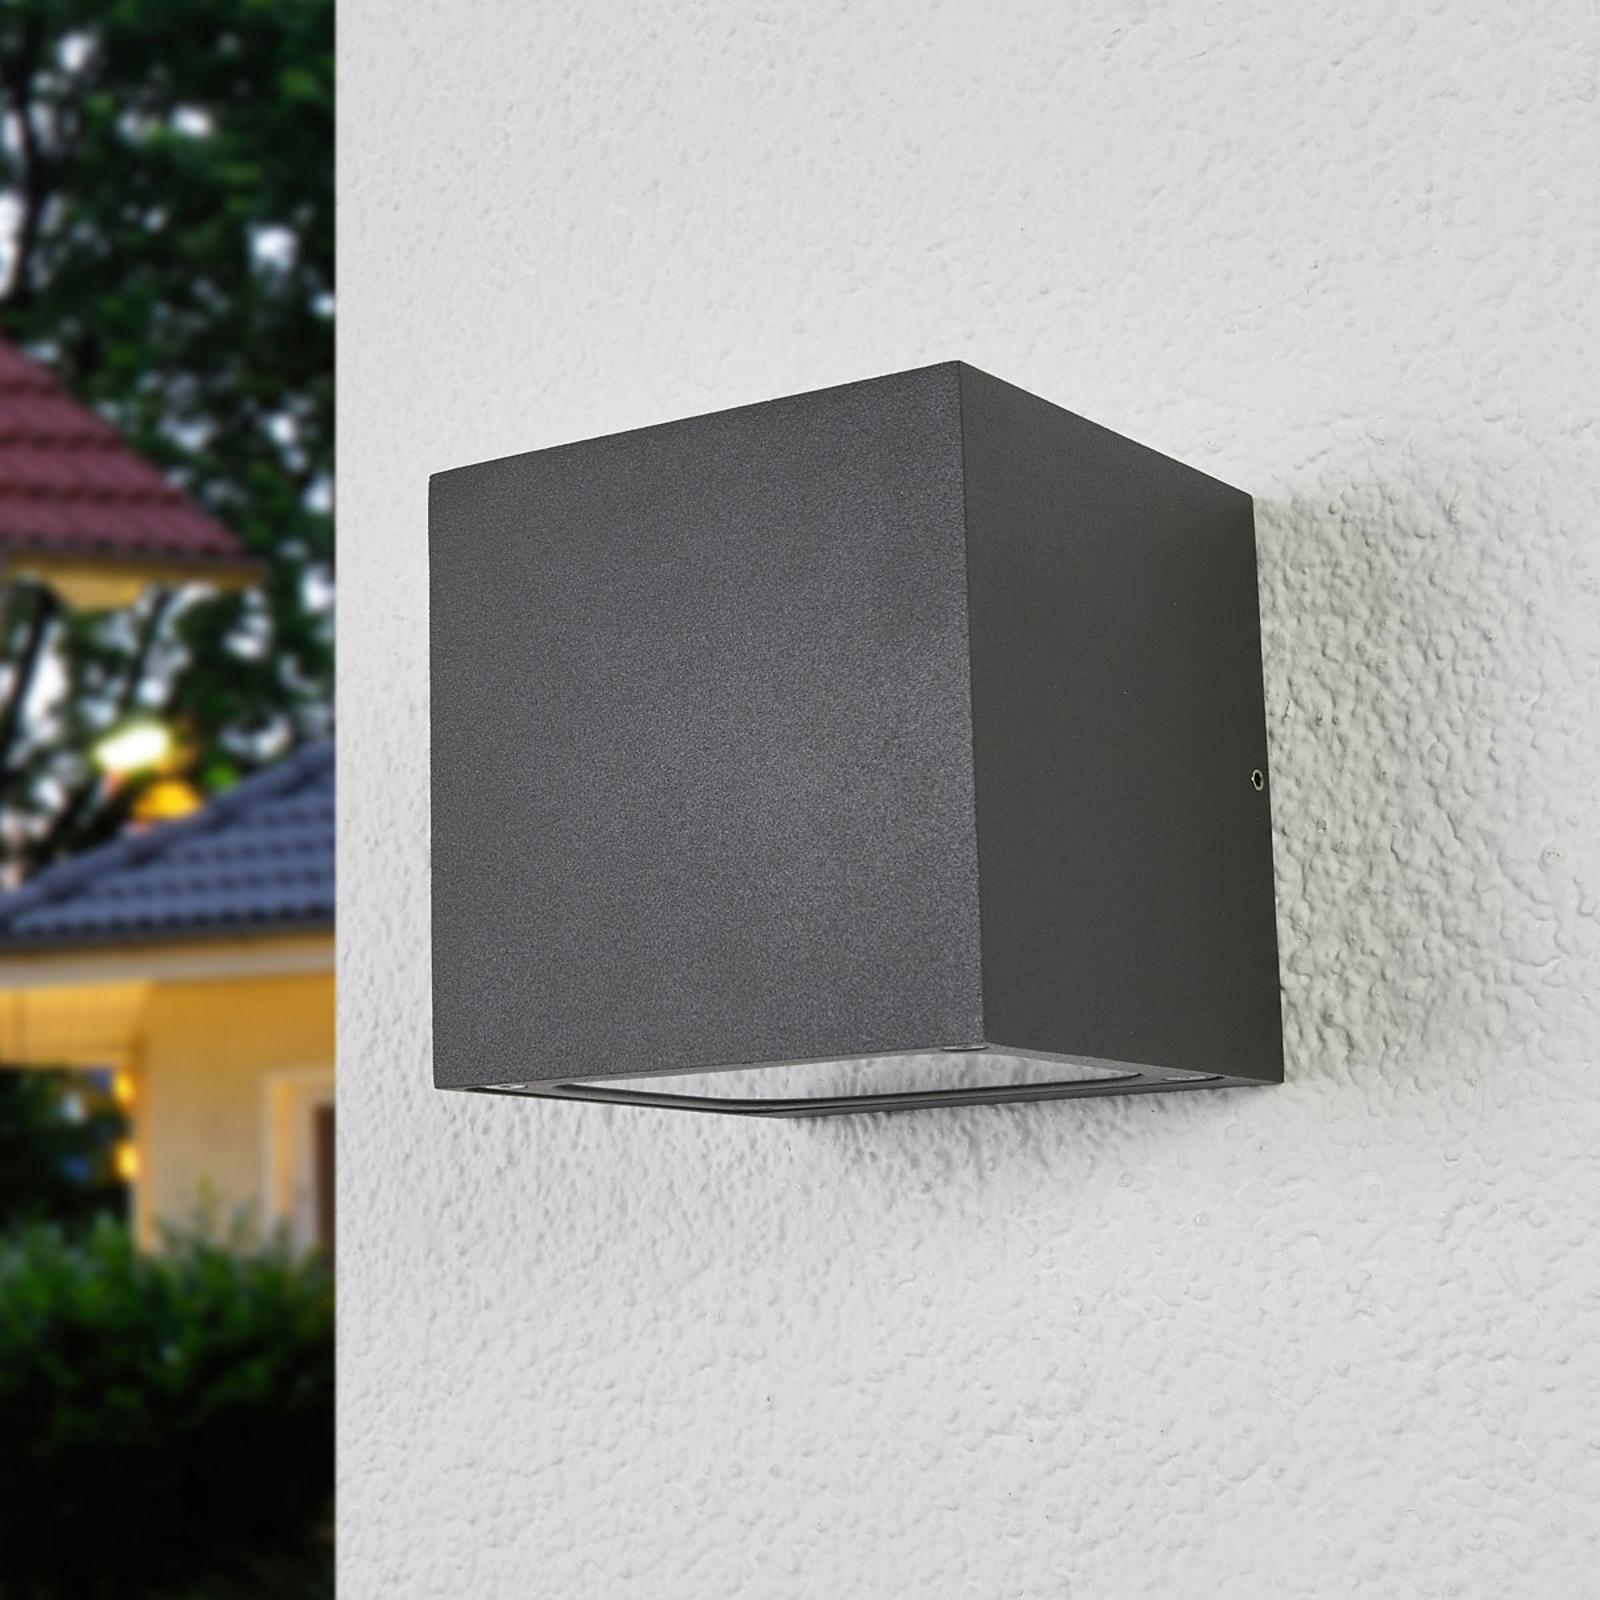 Aplique LED para exterior Merjem, gran luminosidad